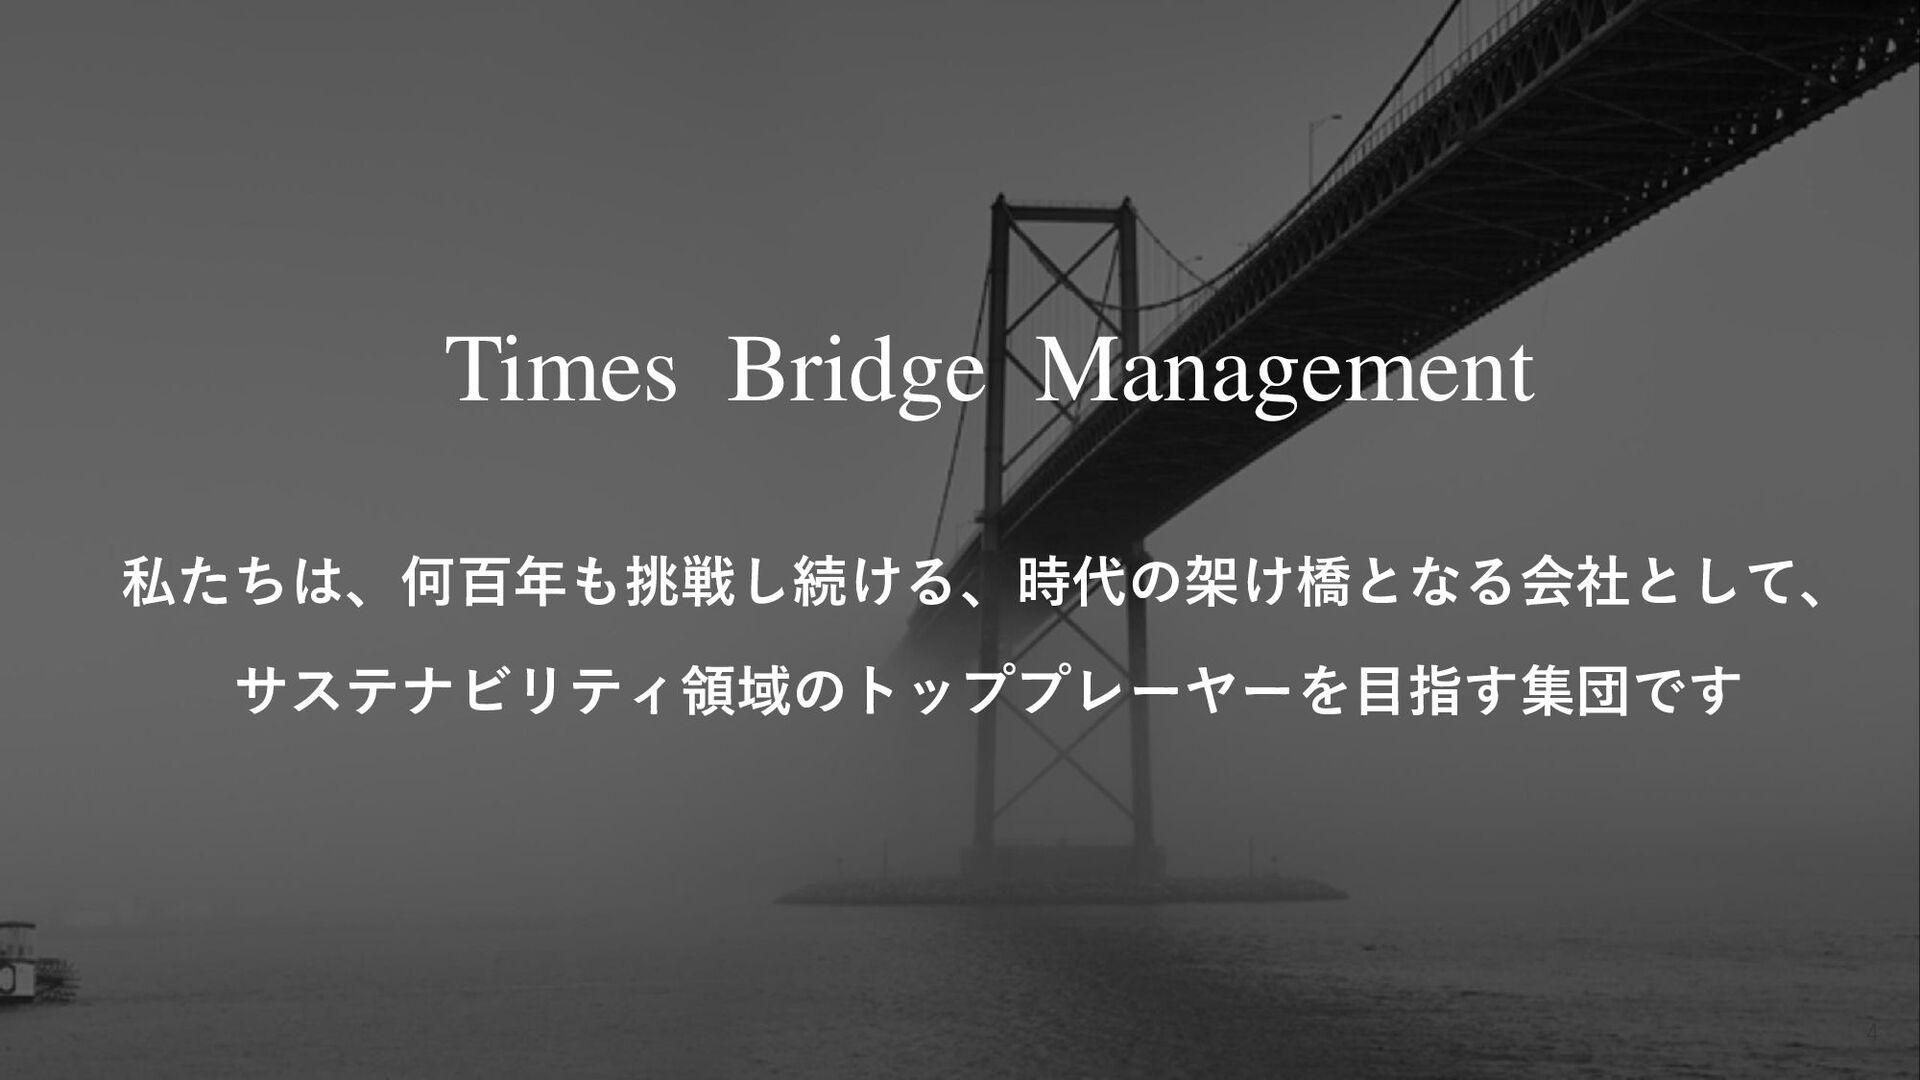 Confidential 日本で史上6社目のユニコーン企業へ 研究開発型ベンチャーとして日本1...